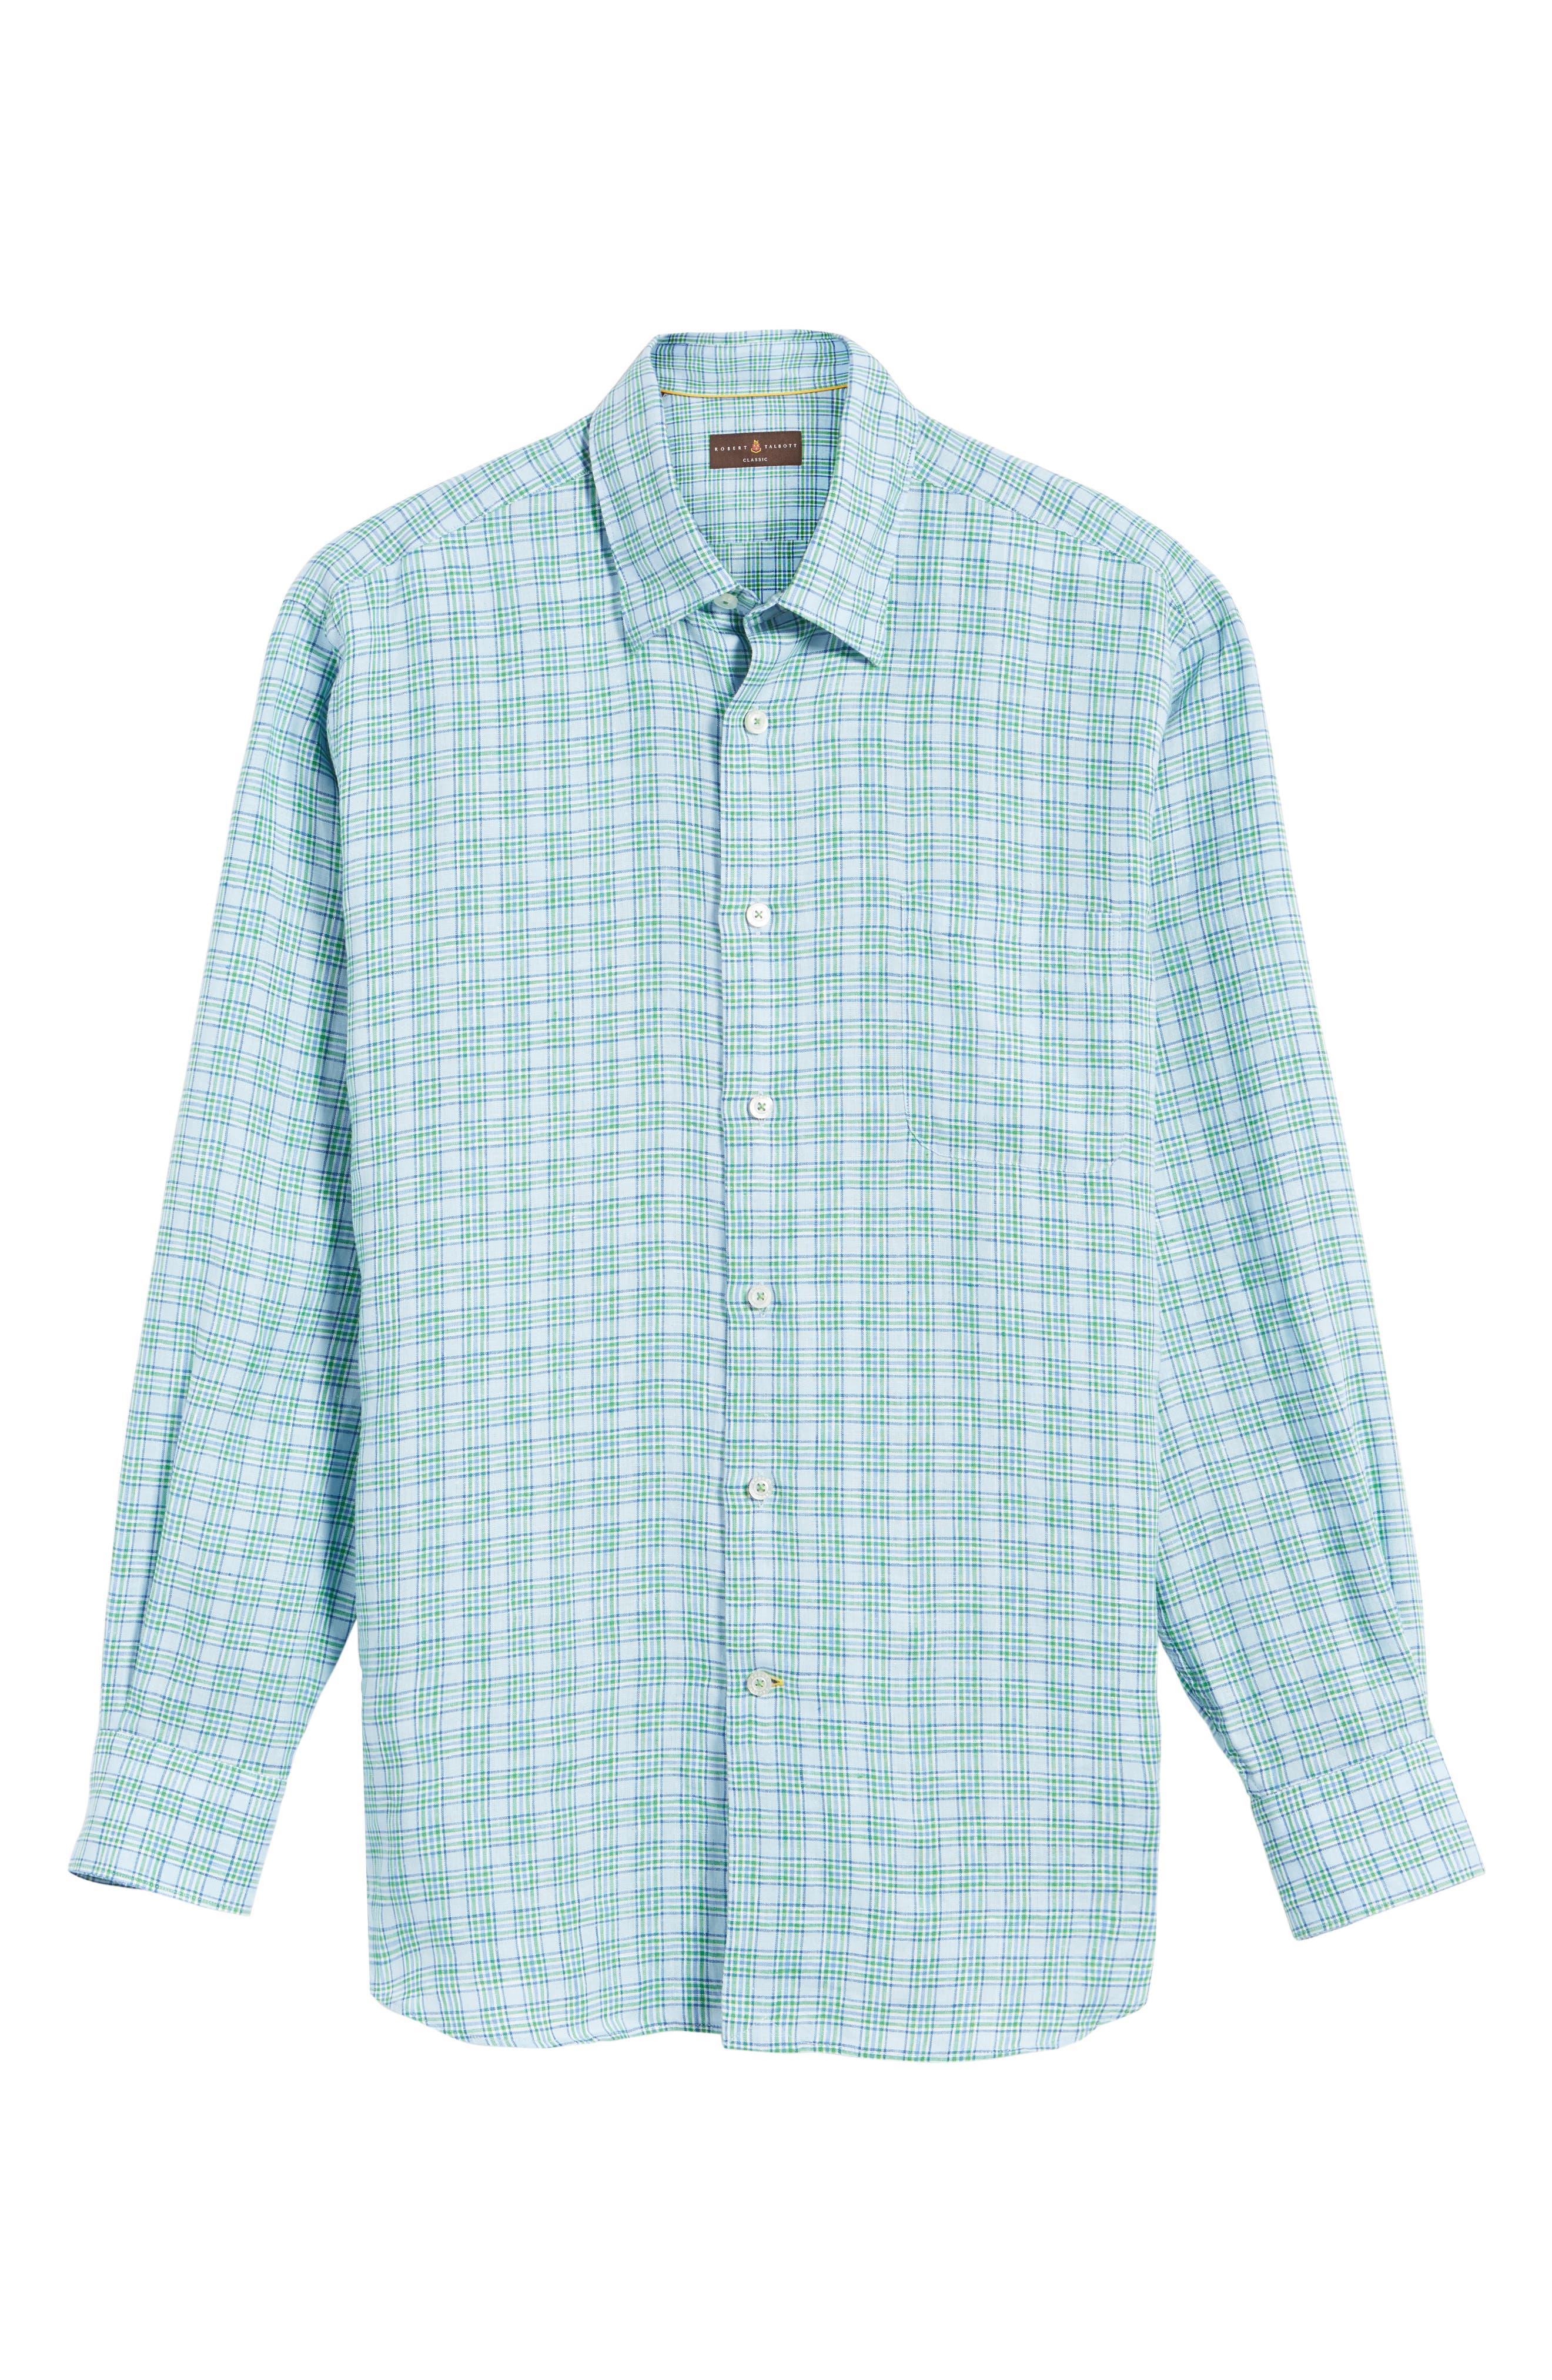 Anderson Classic Fit Sport Shirt,                             Alternate thumbnail 6, color,                             449